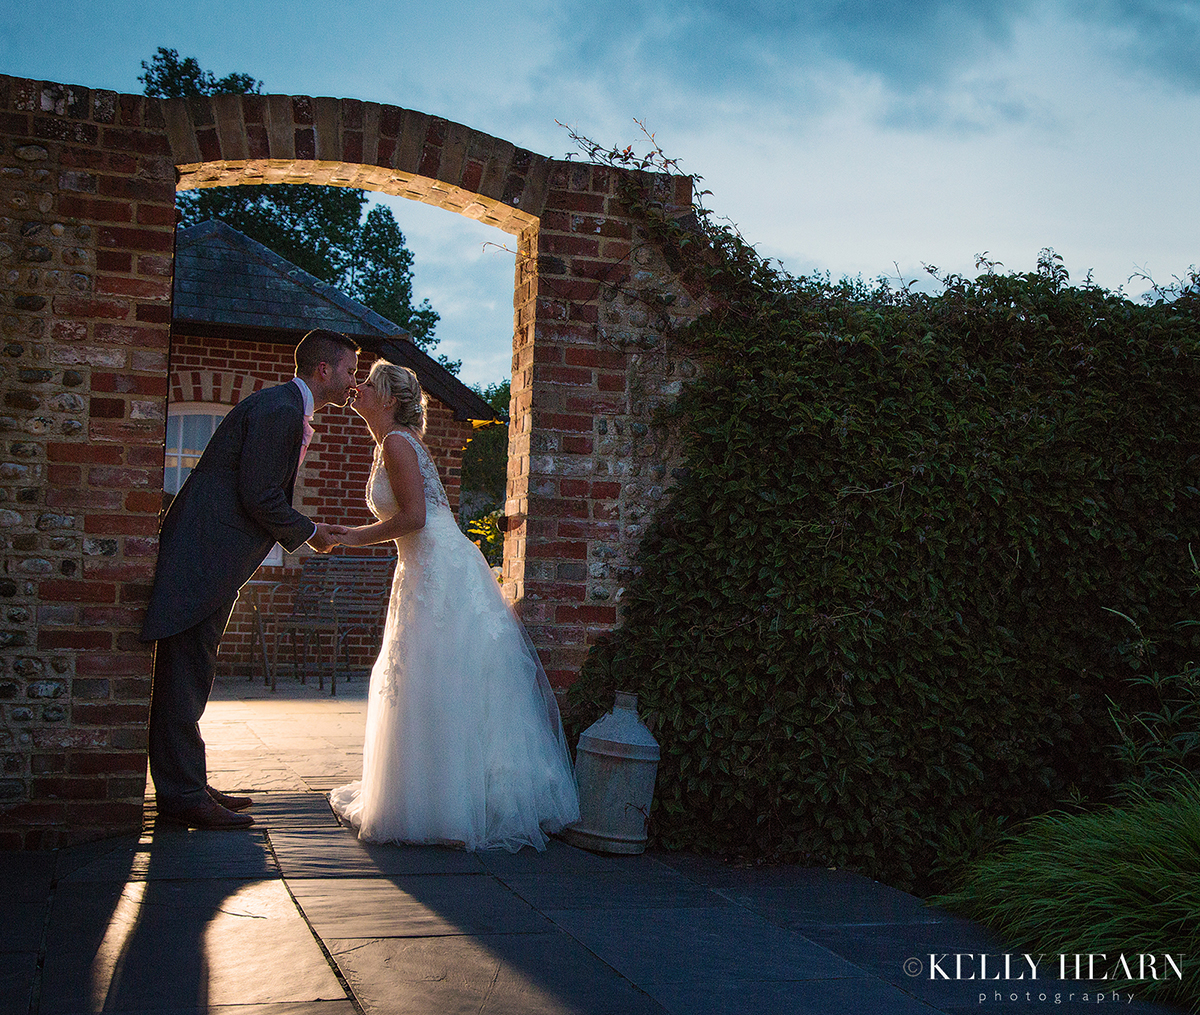 THO_bride-groom-kiss-archway.jpg#asset:2101